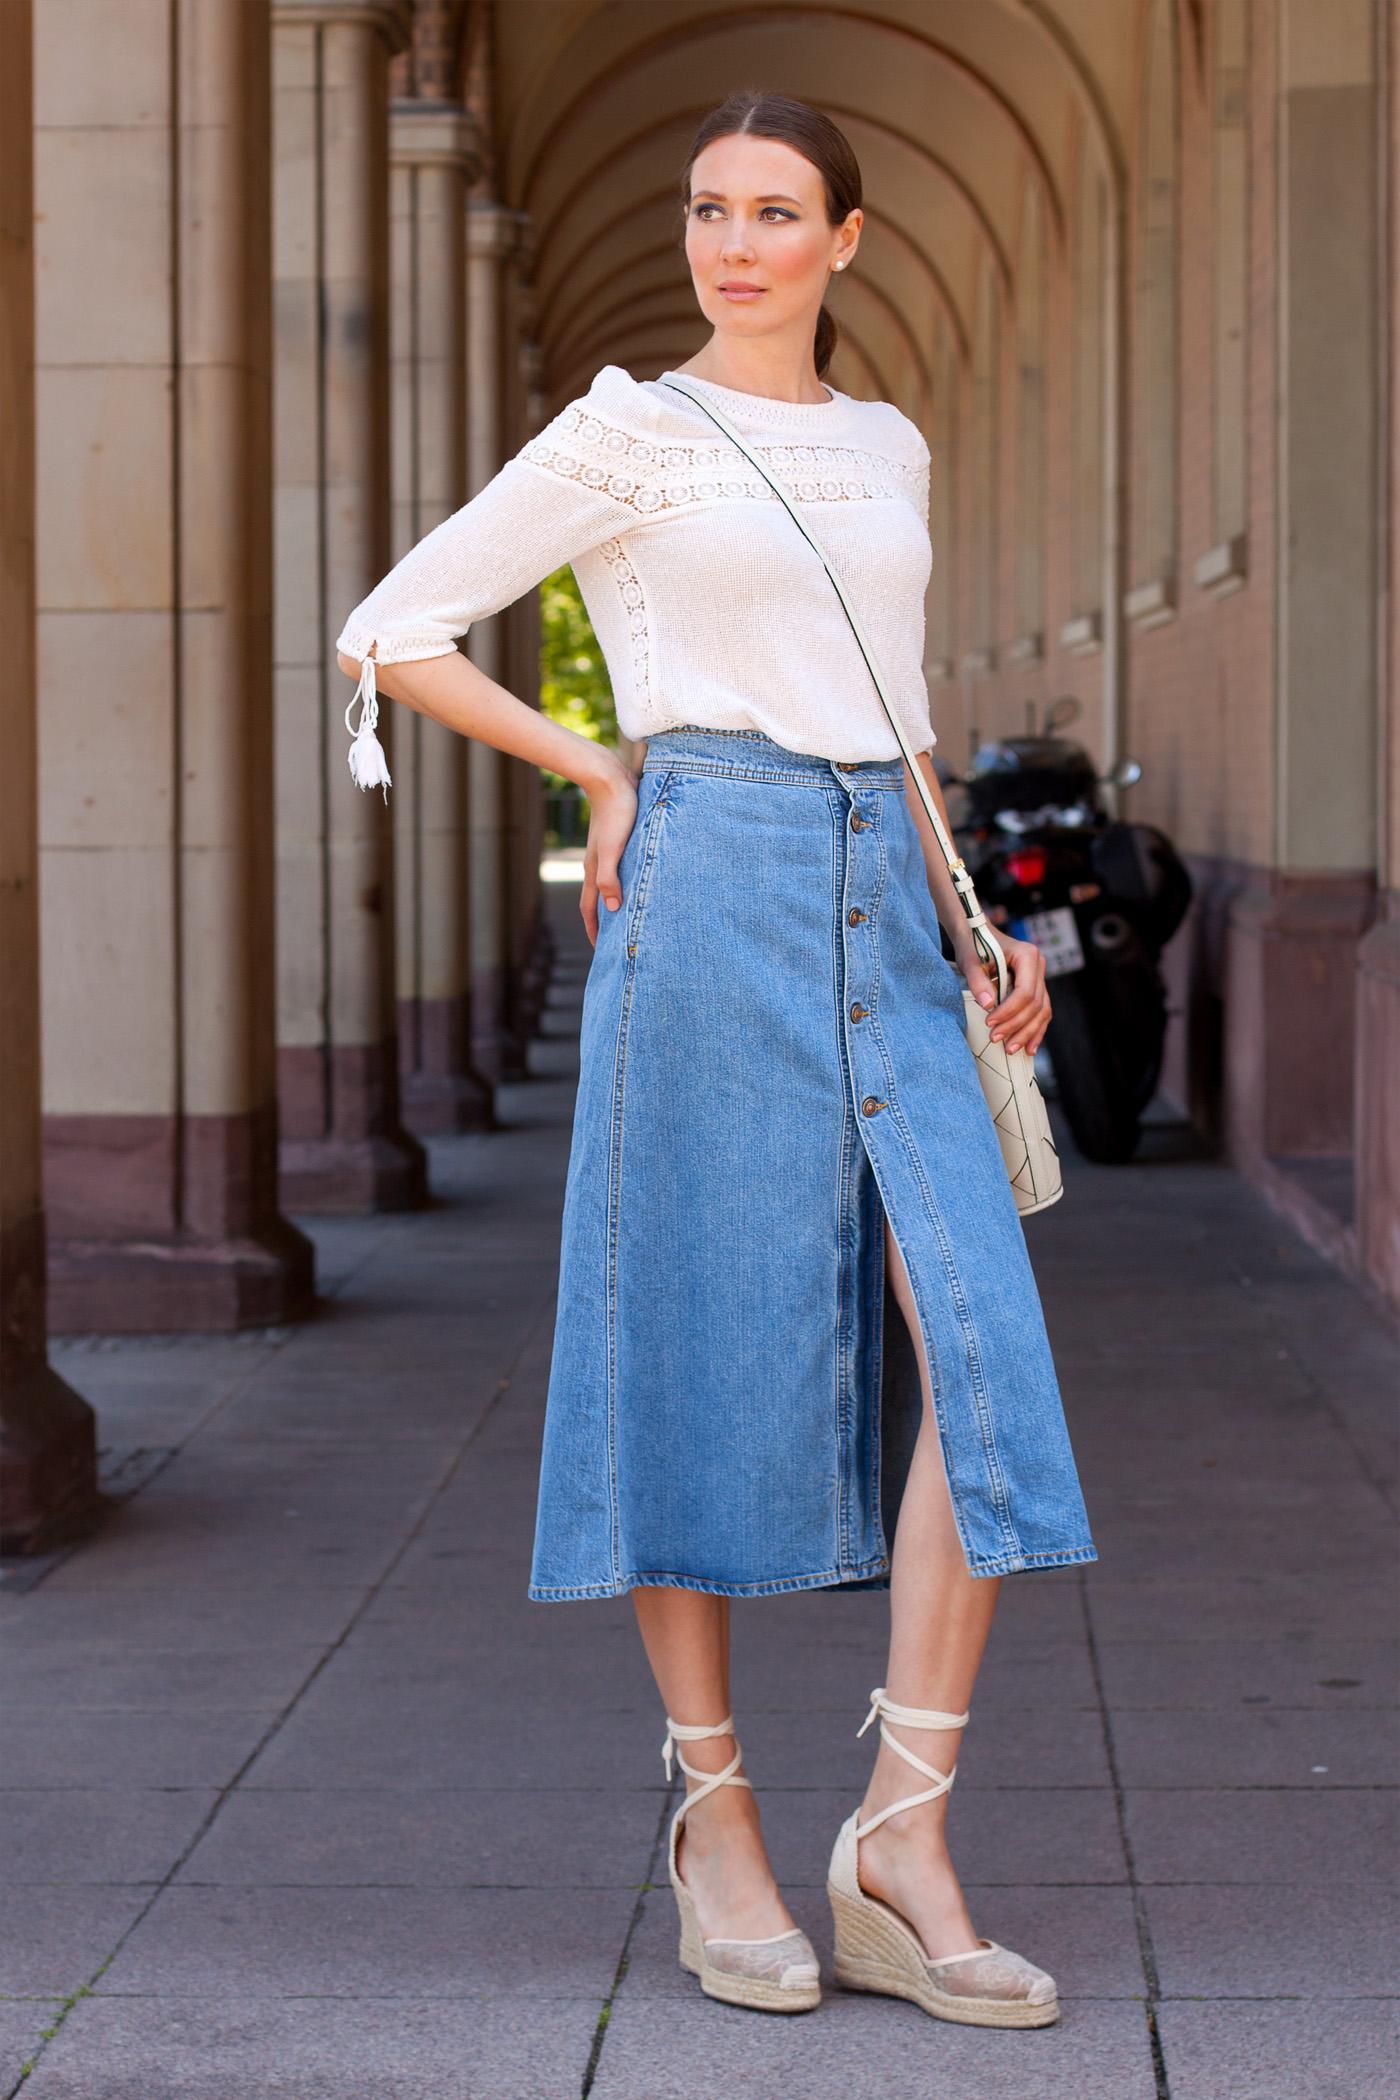 Denim maxi skirt outfits | Global trend skirt blog